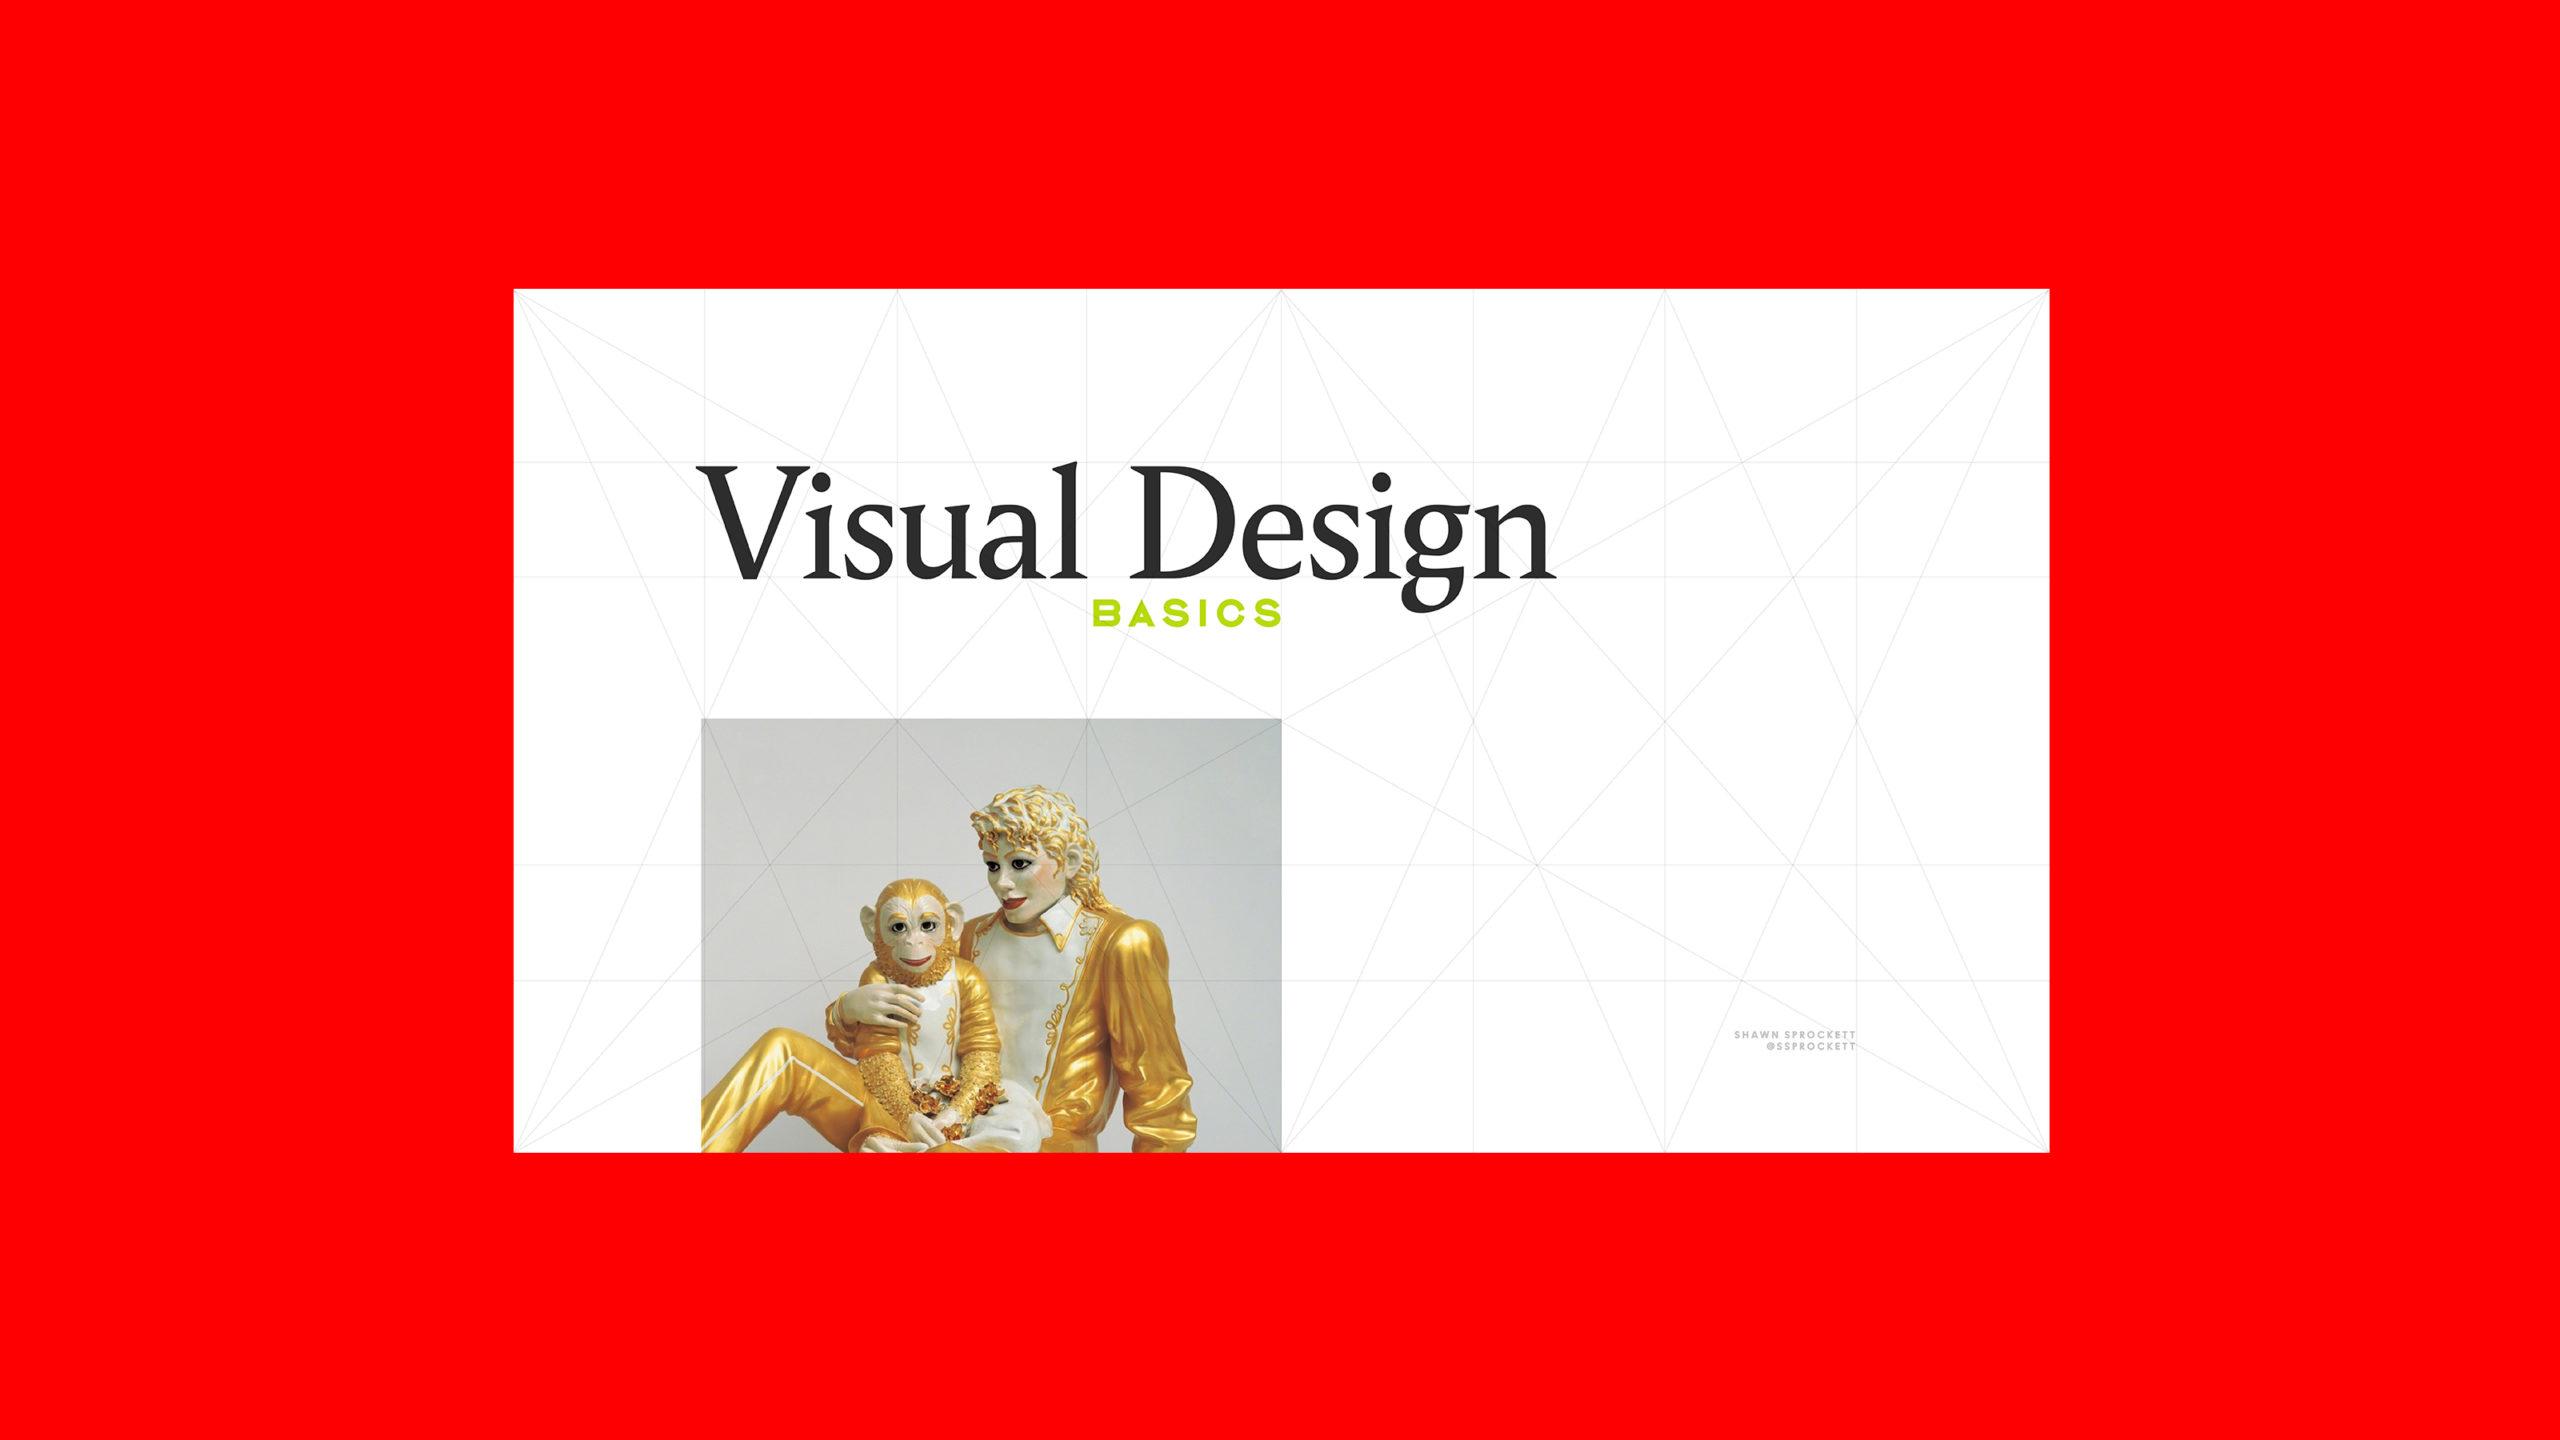 shawn sprockett visual design